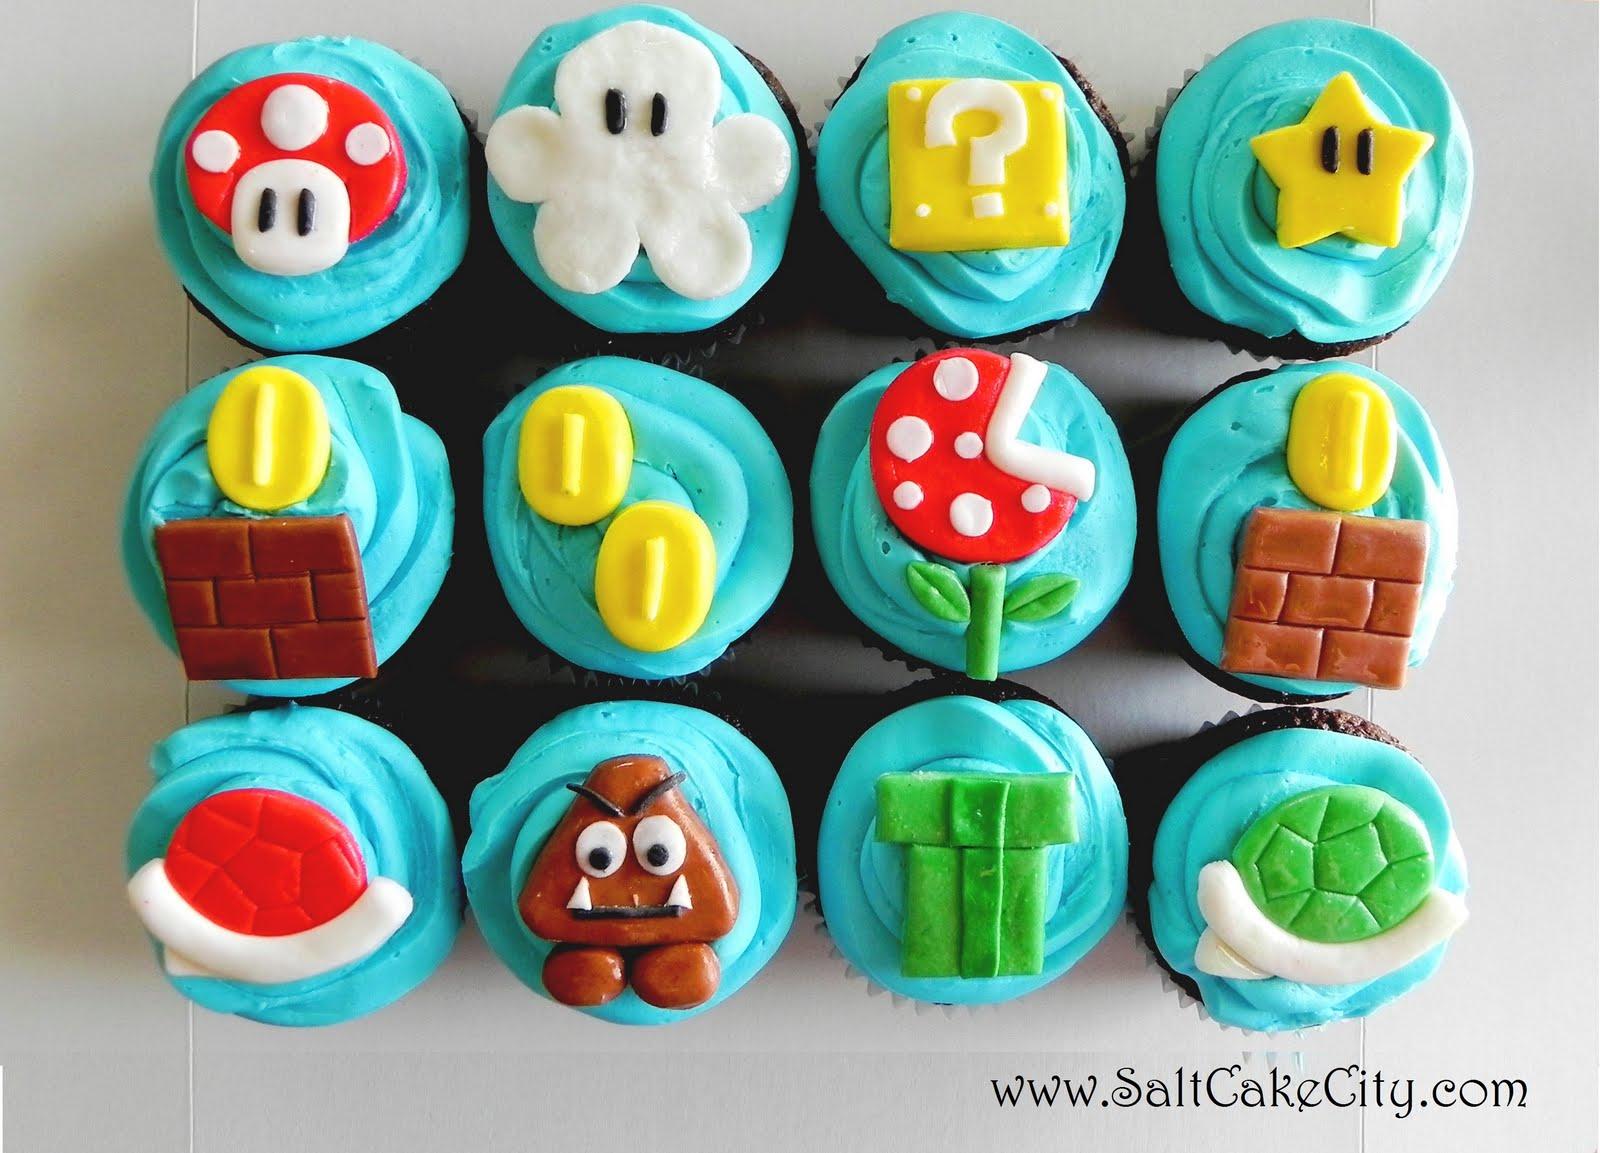 http://2.bp.blogspot.com/_TQzvUhlan6M/S_rnRXKAhzI/AAAAAAAAAro/EPGQdz4X7rU/s1600/152+Mario+Cupcakes.jpg